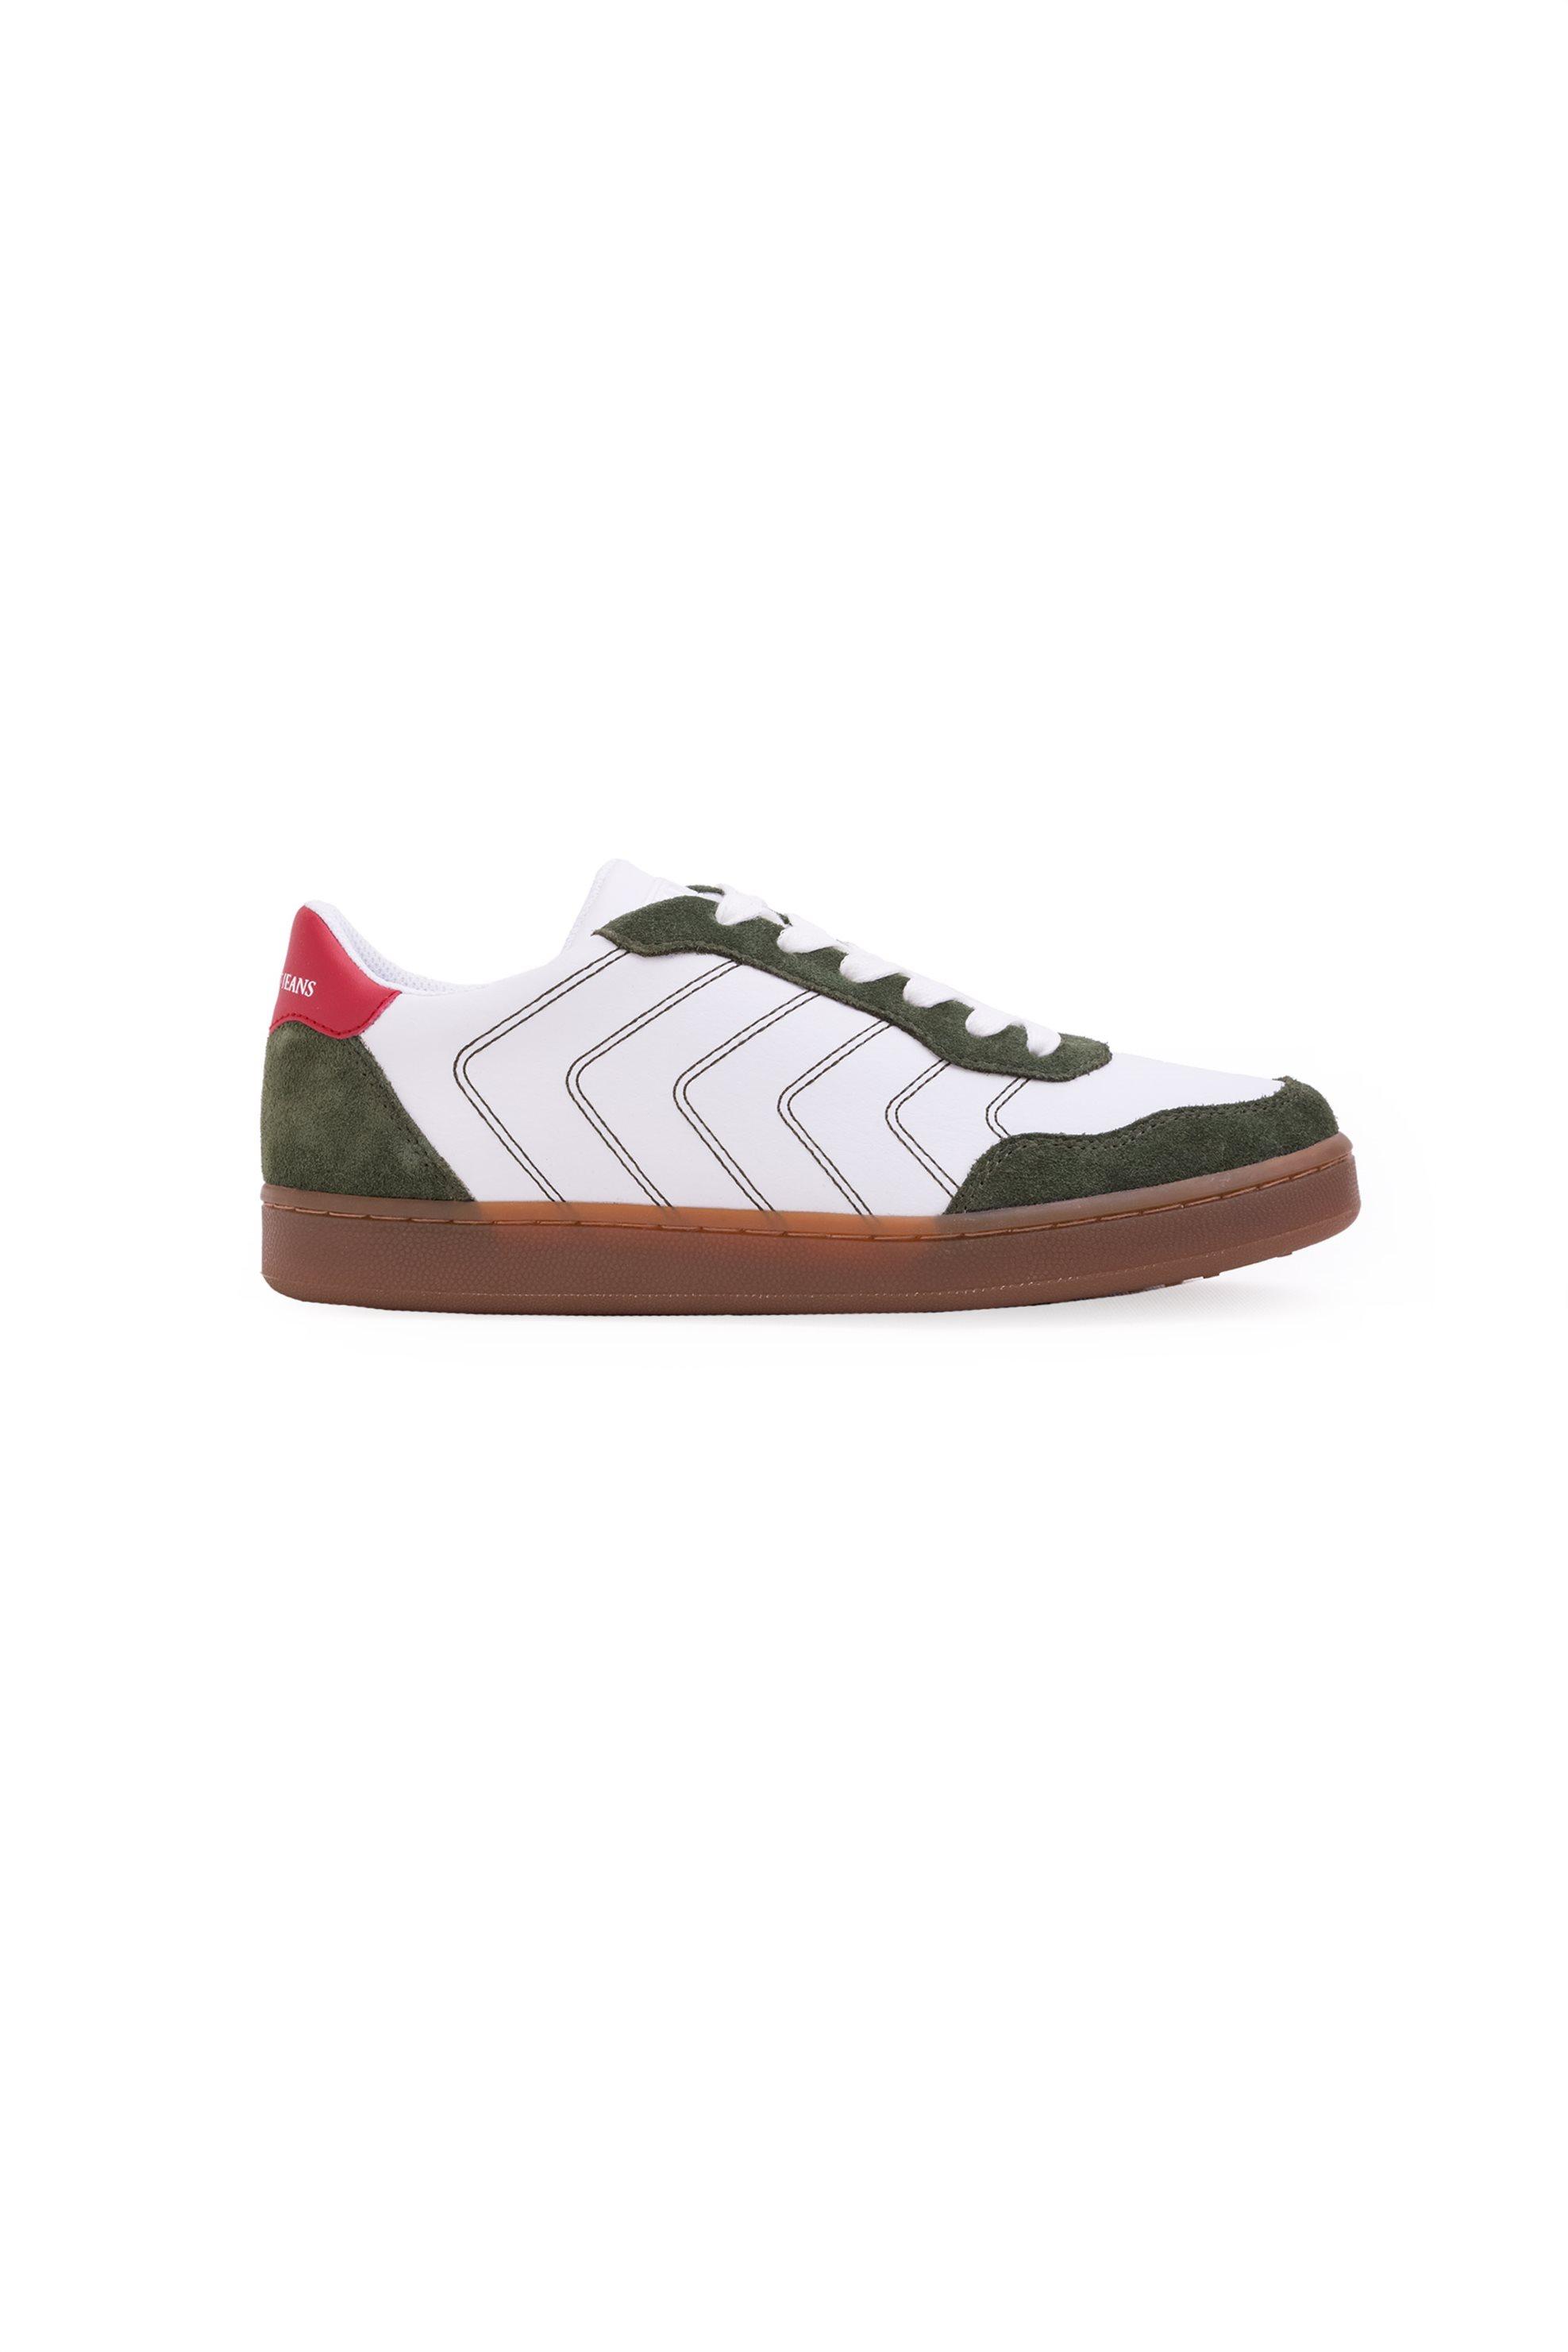 Aνδρικά παπούτσια Τrussardi – 77A00061-9Y099999 – Κυπαρισσί